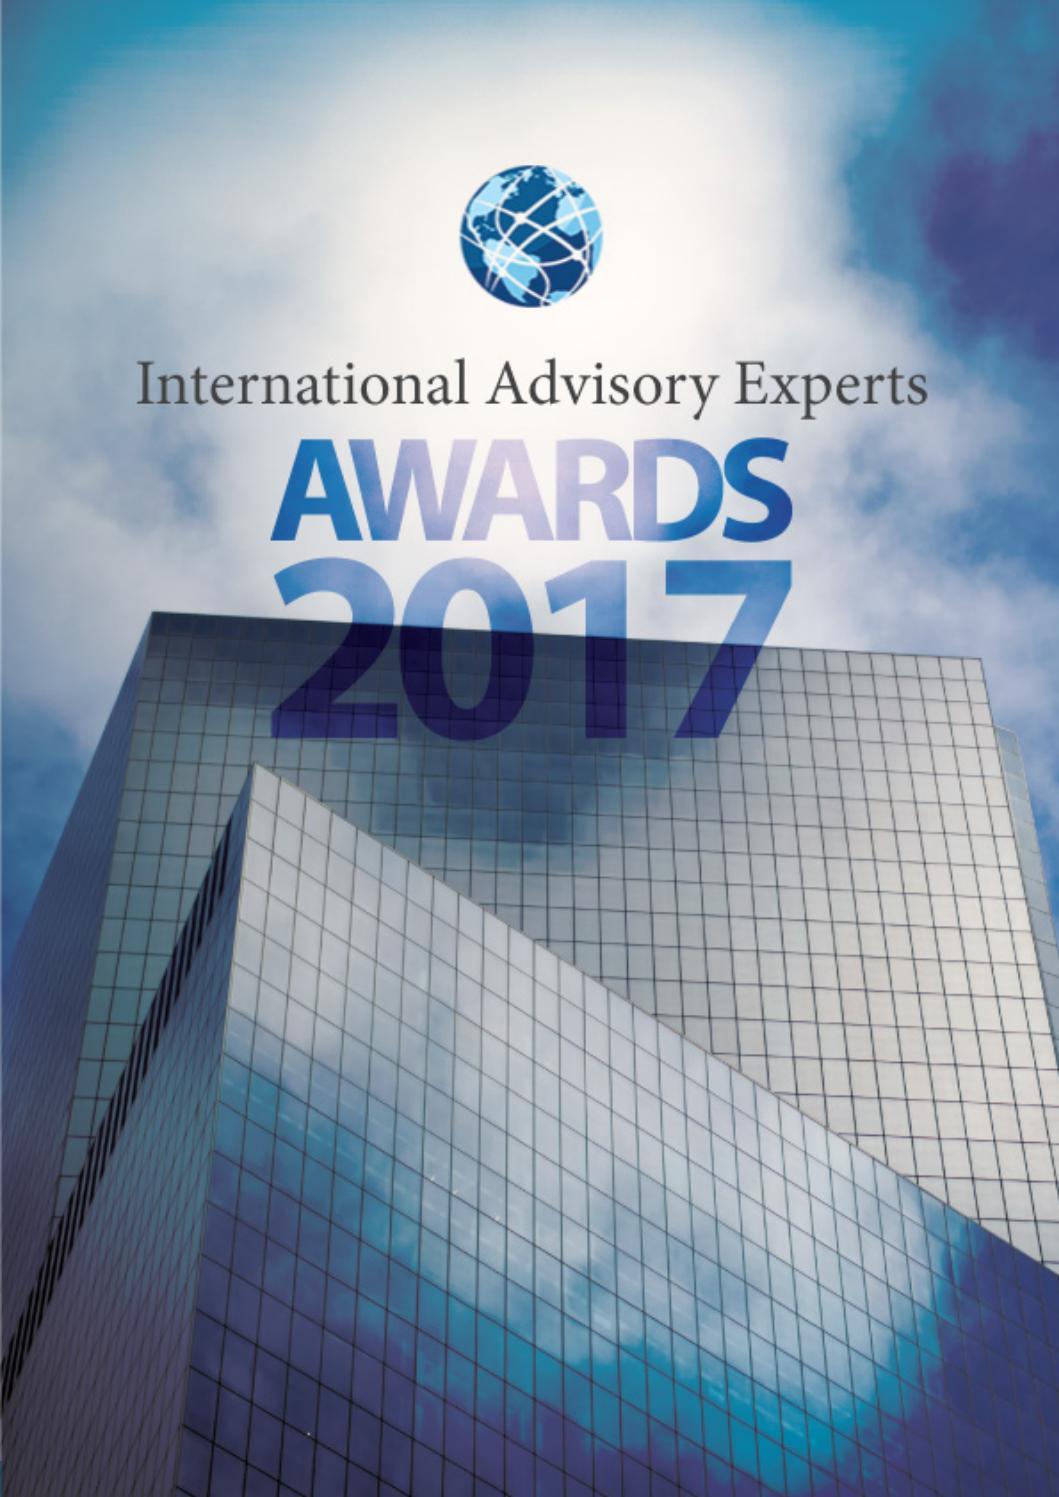 2017 International Advisory Experts Awards Final Magazine By Palanta L Chairs Big 90 Bean Bag Cover Abu Issuu